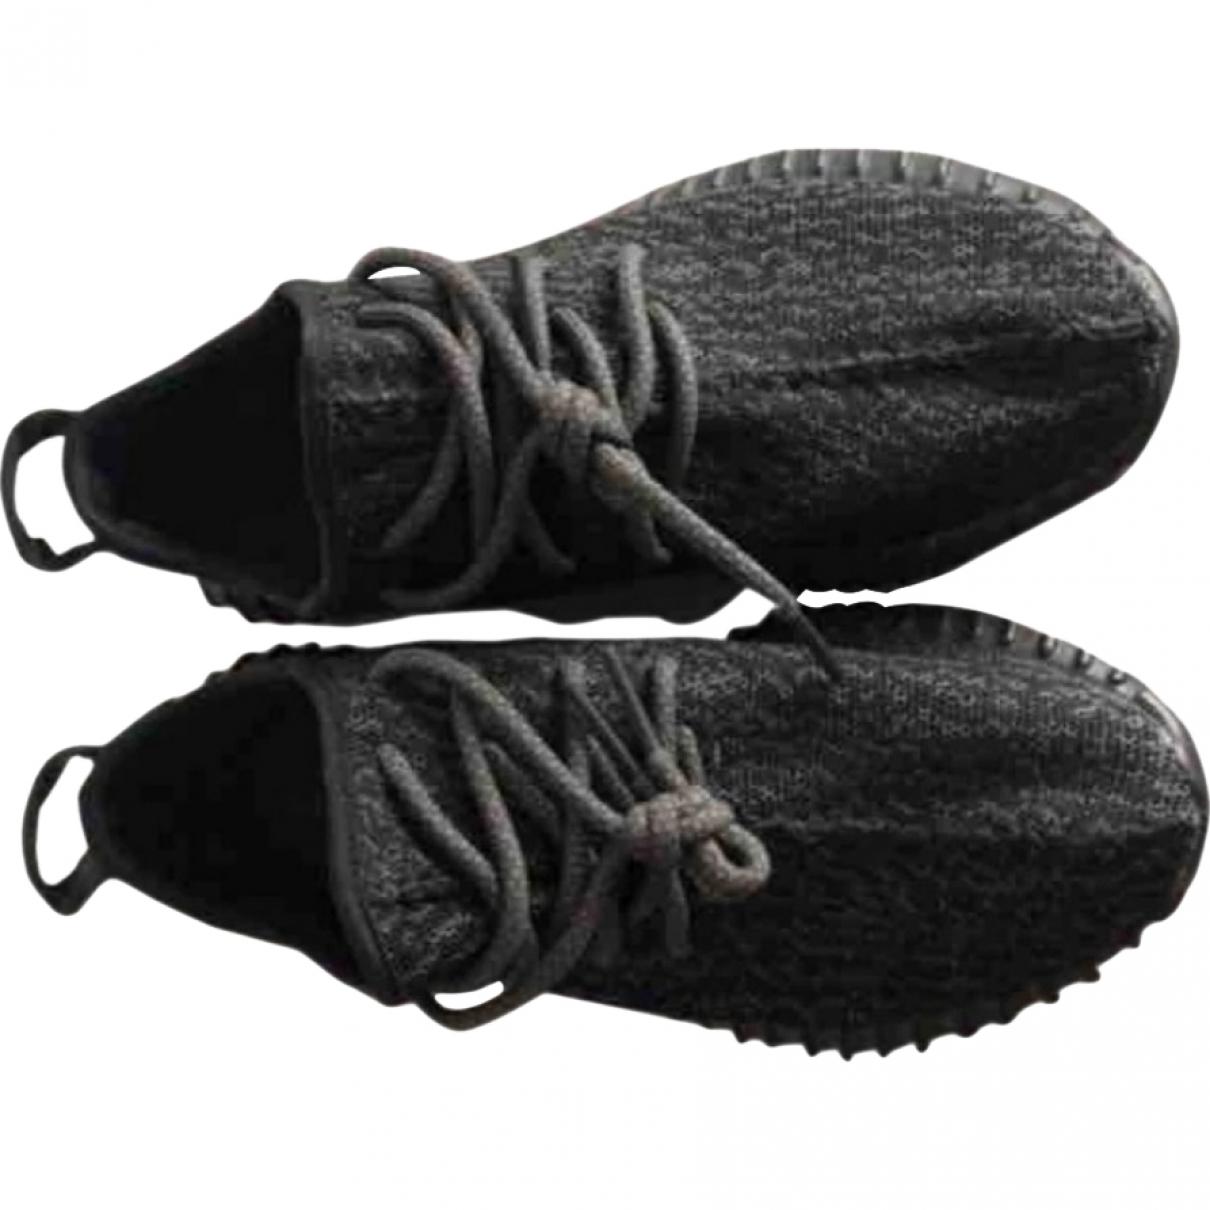 Yeezy X Adidas \N Black Cloth Trainers for Men 39.5 EU